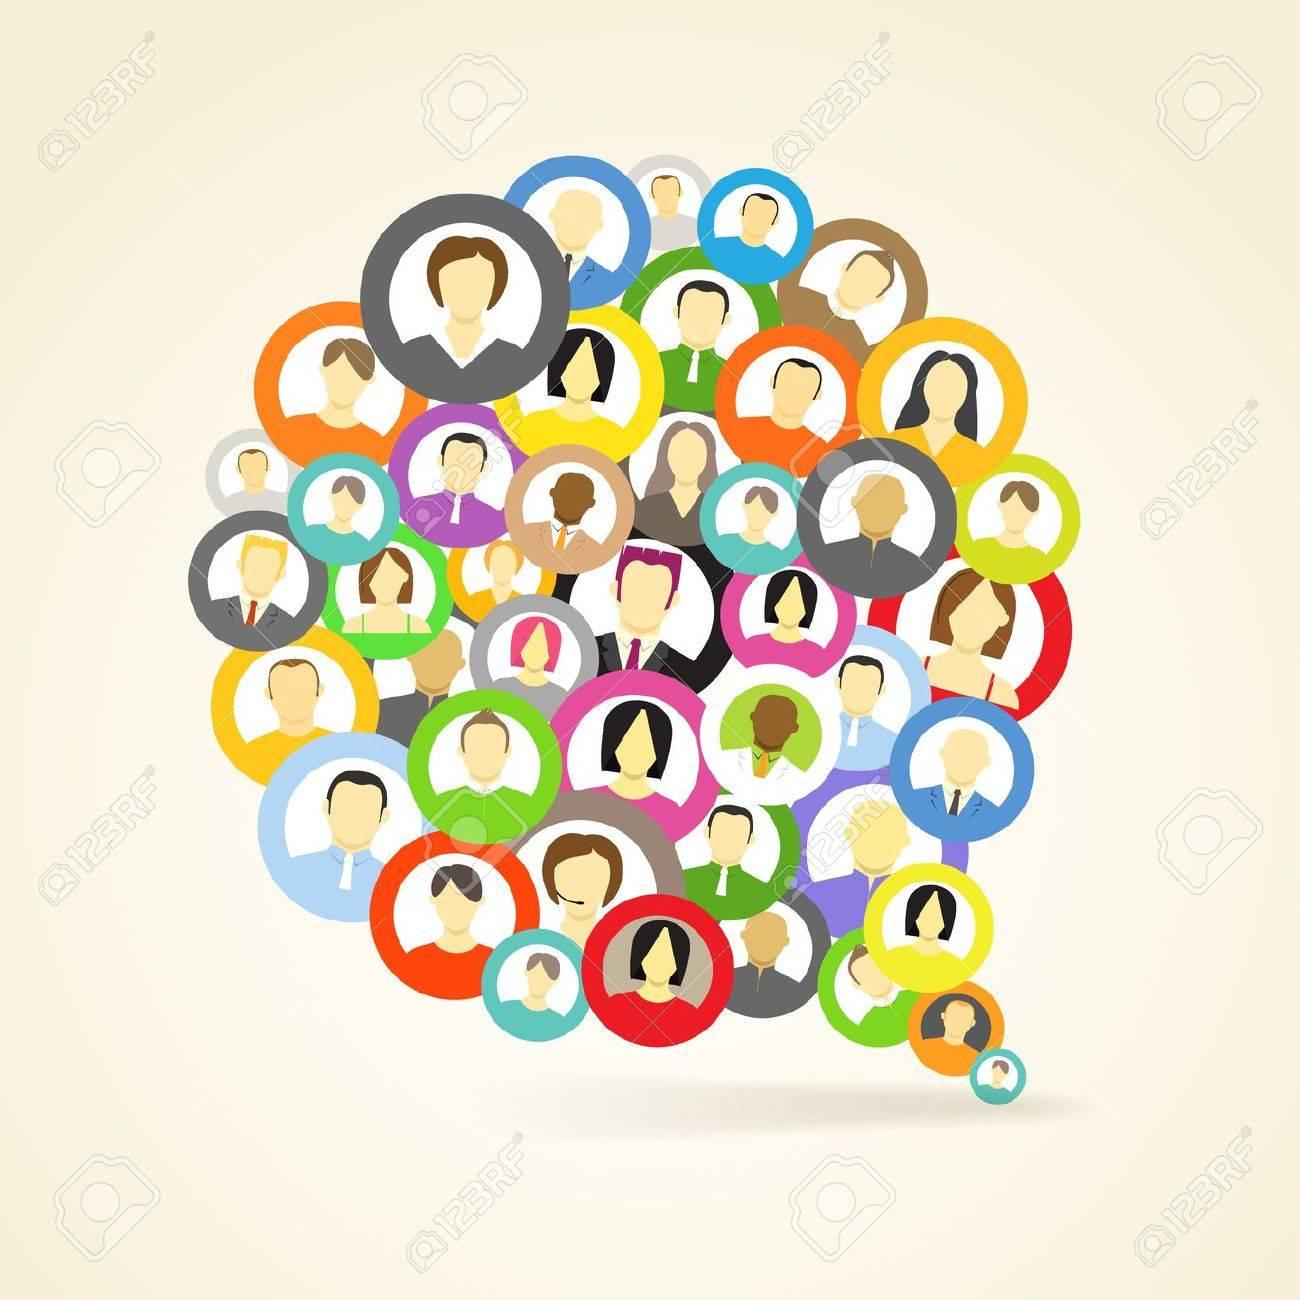 Abstract speech cloud of network avatars Stock Vector - 13843638